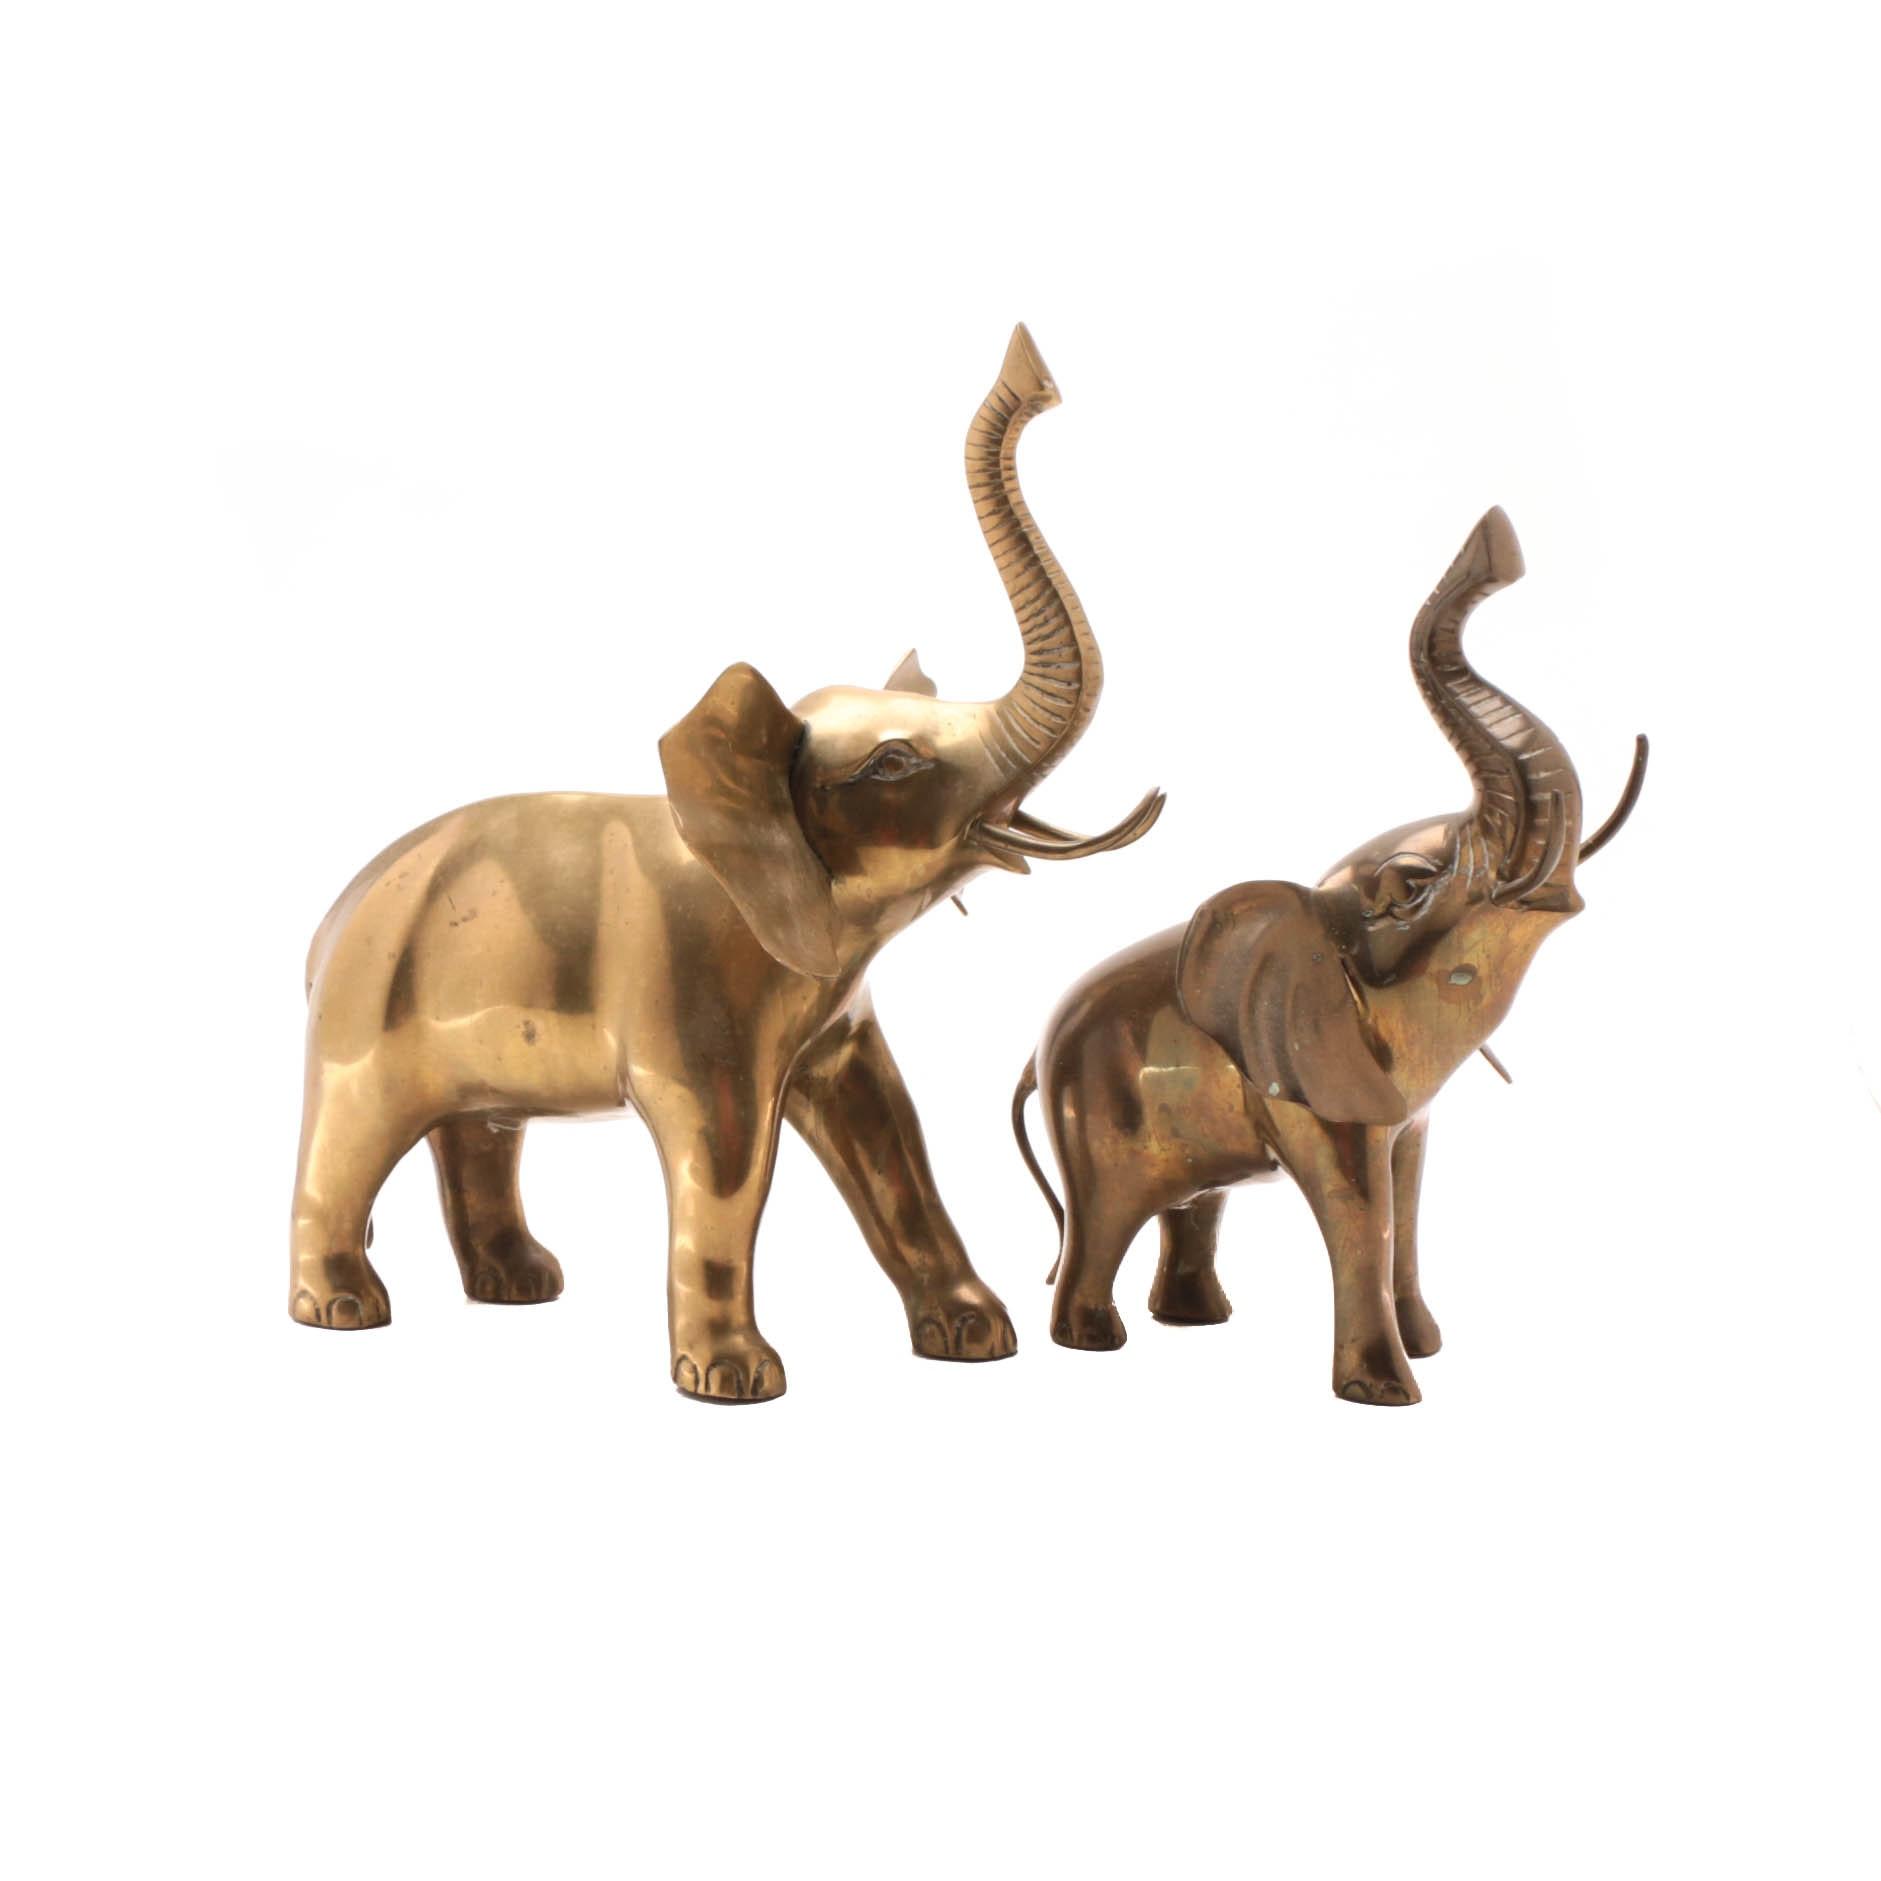 Two Brass Elephant Figures